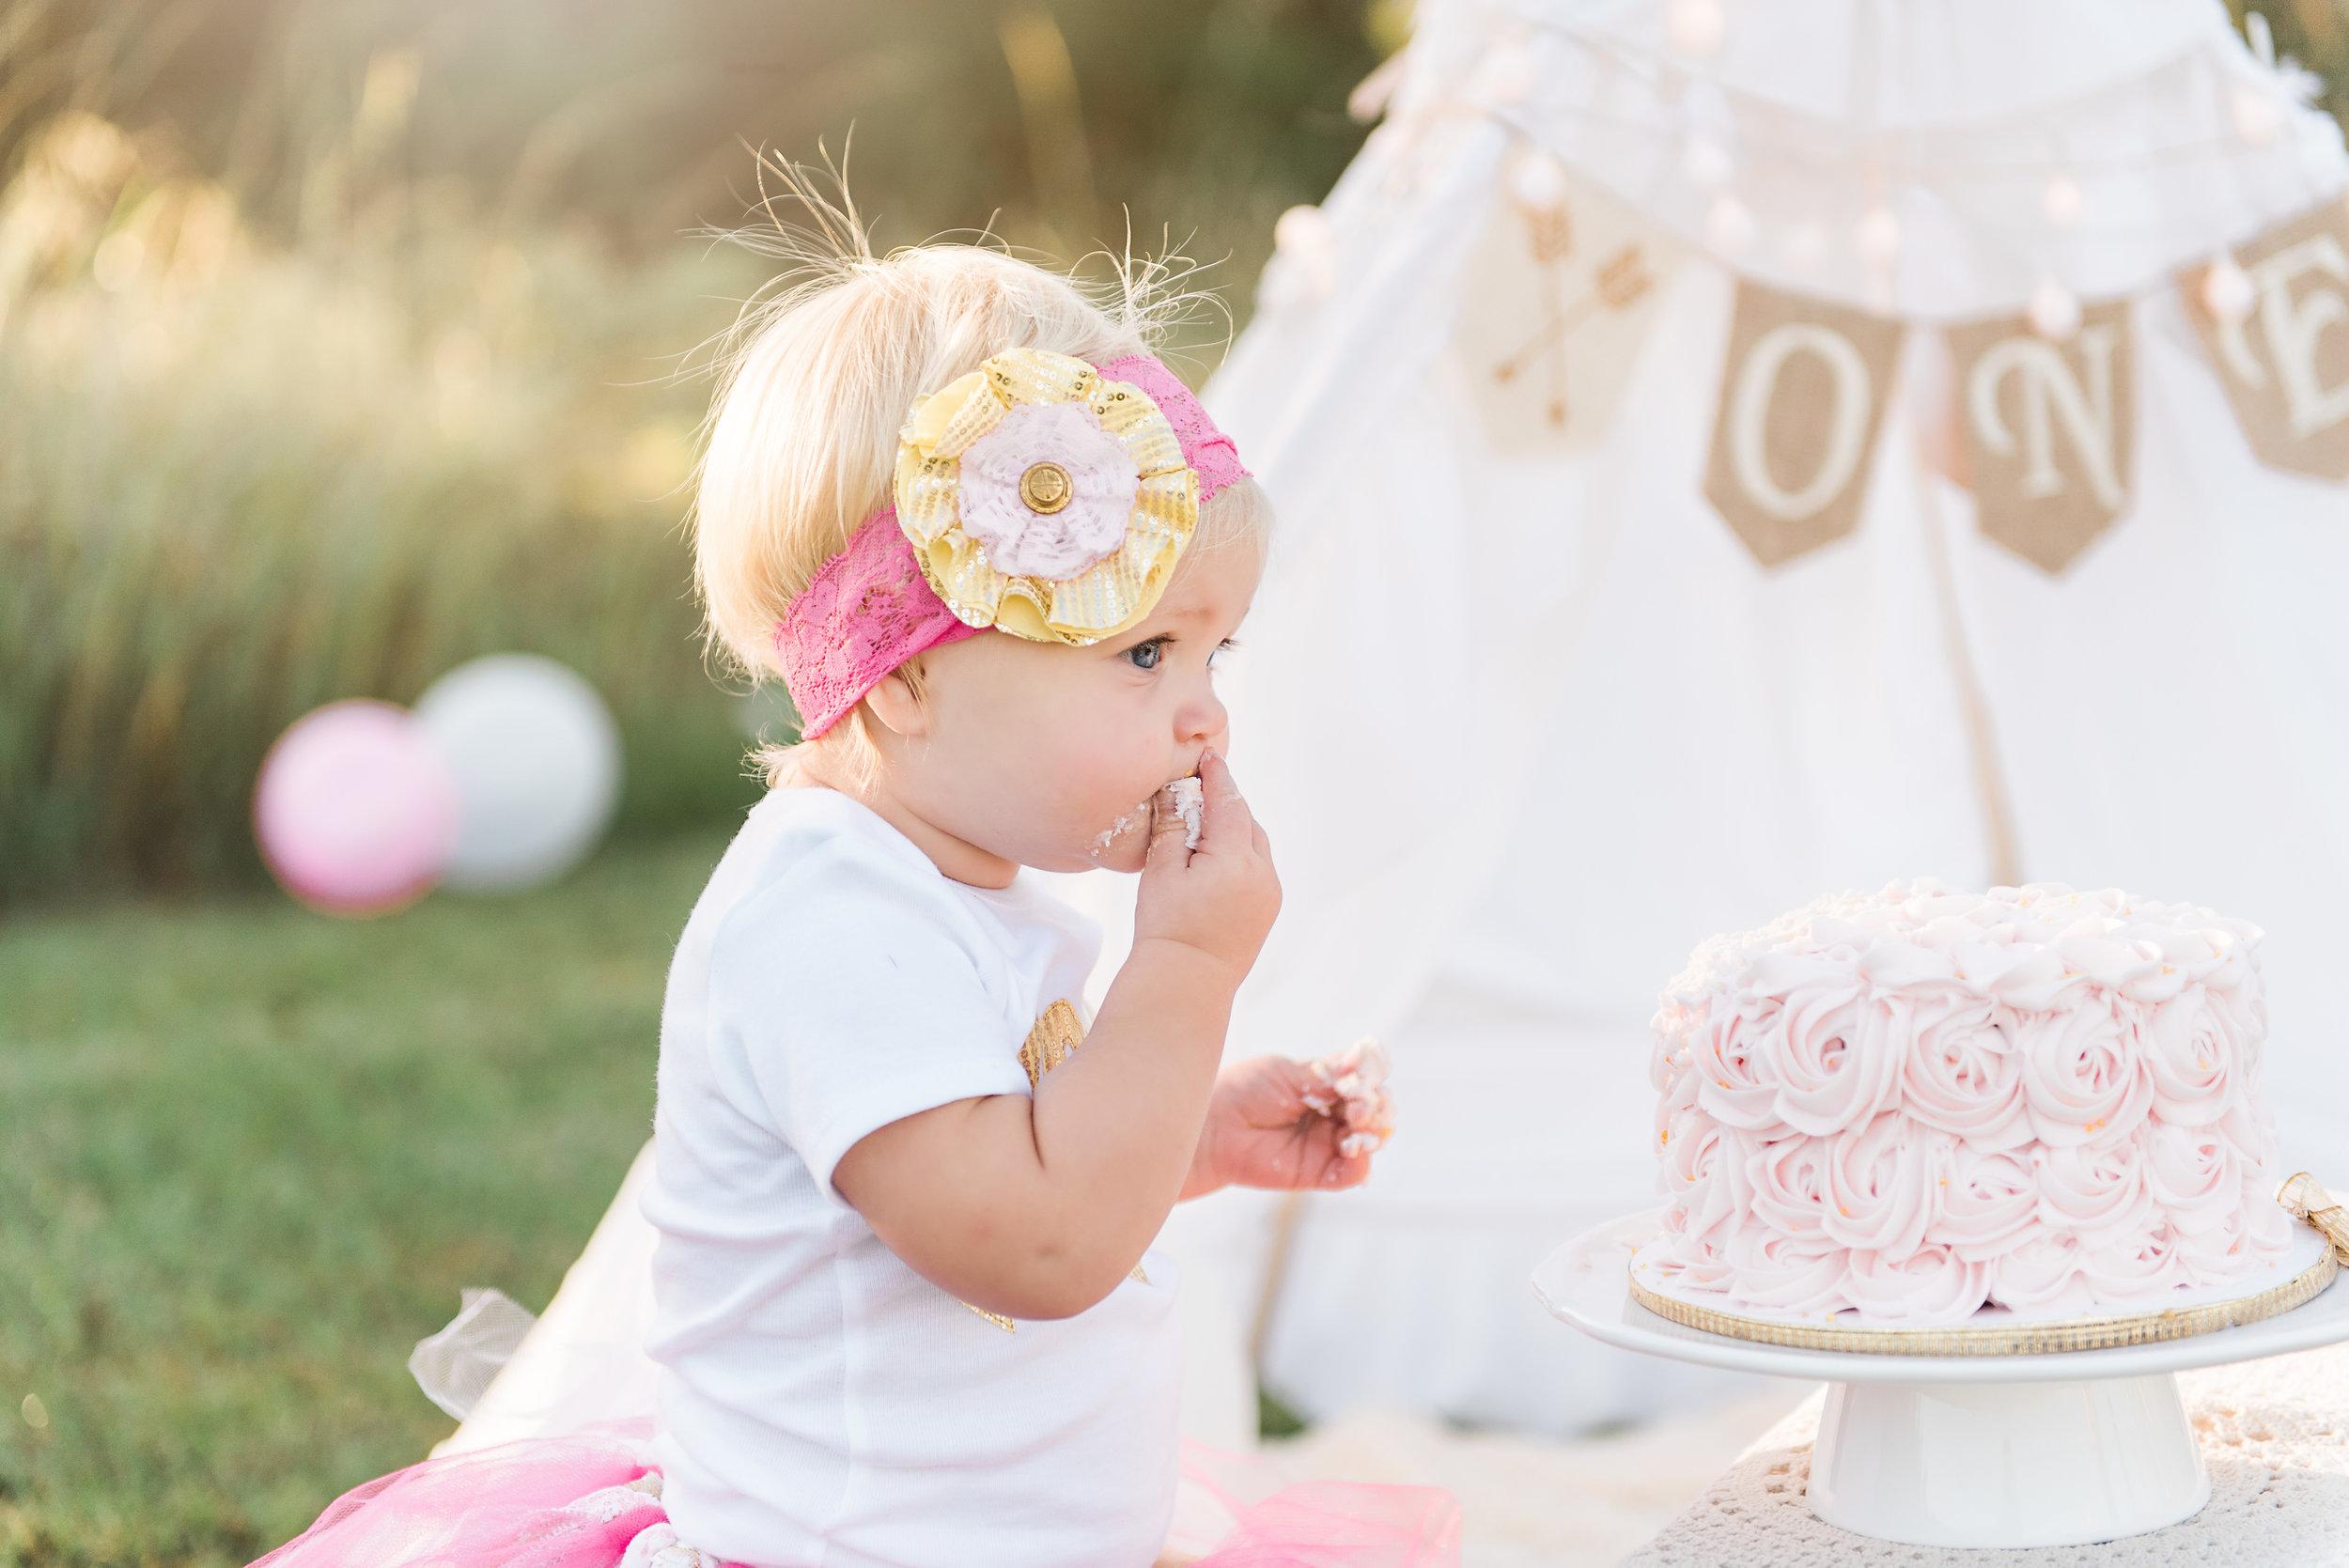 cakesmash-richmond-hill-ga-children-photography